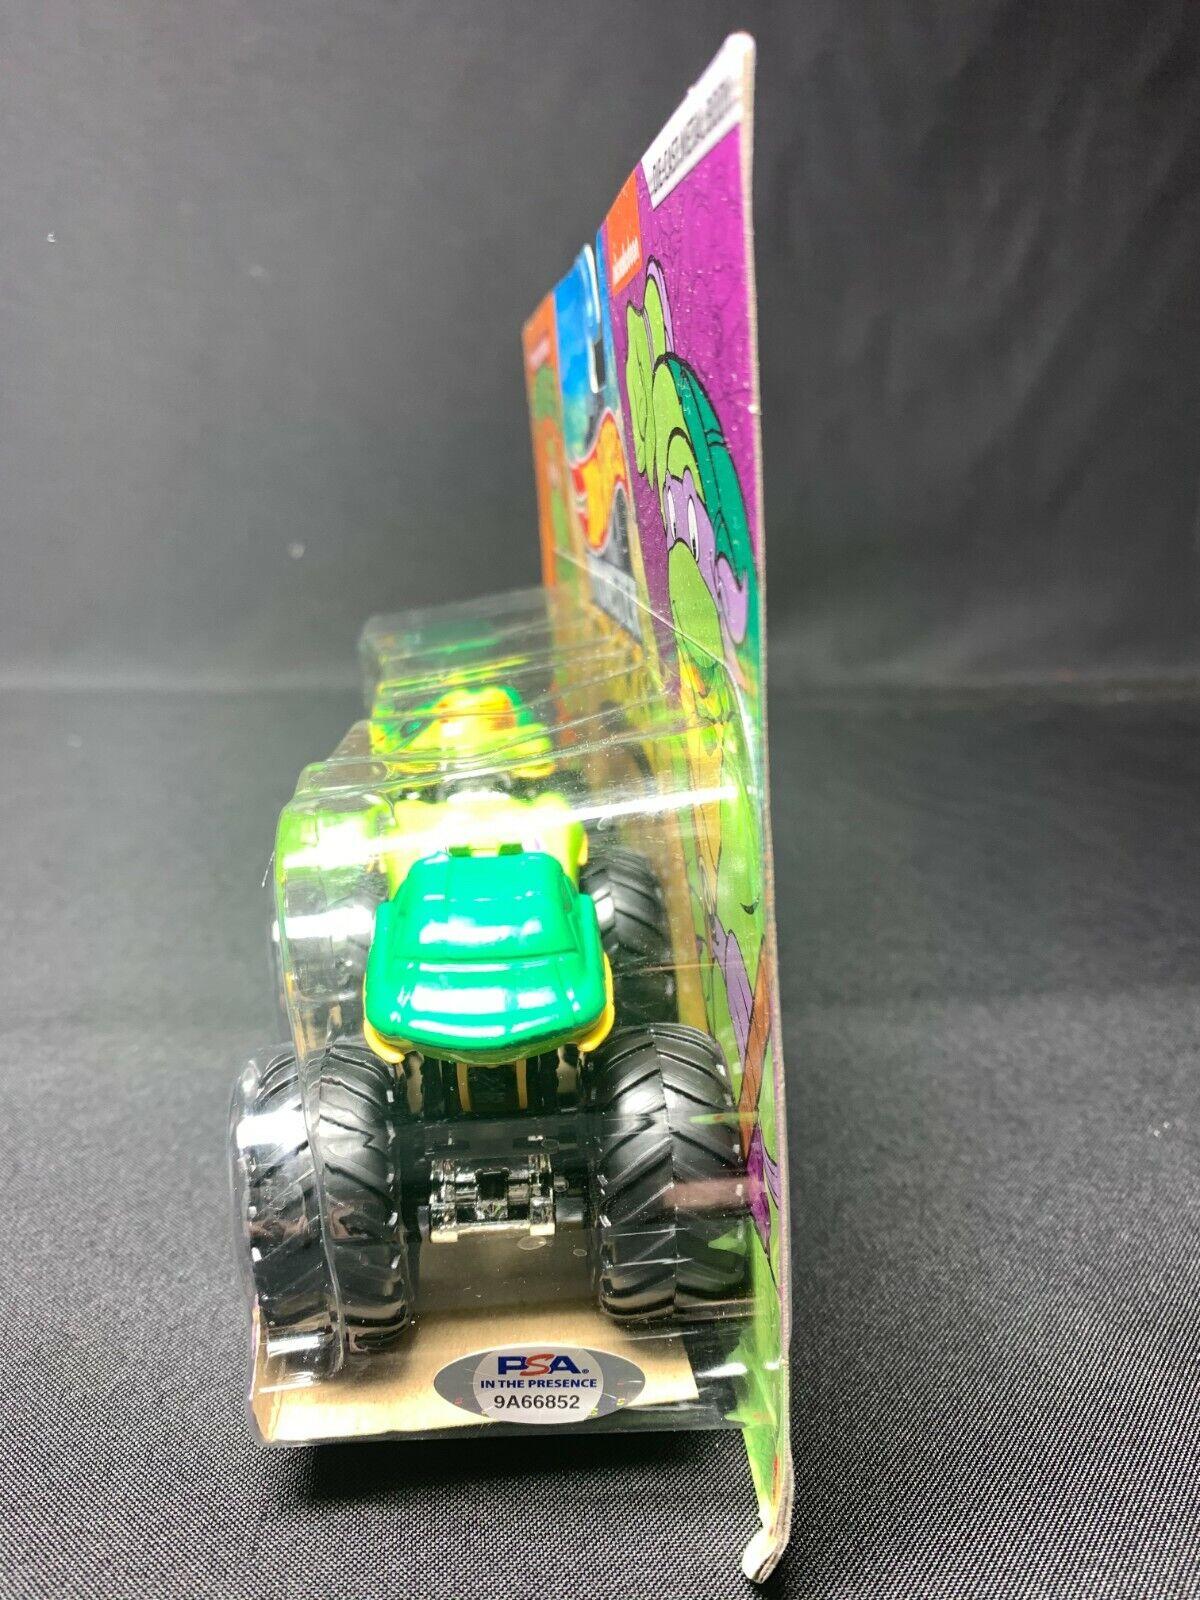 Kevin Eastman Signed Ninja Turtles Hot Wheels Truck PSA 9A66852 Donatello - $149.96